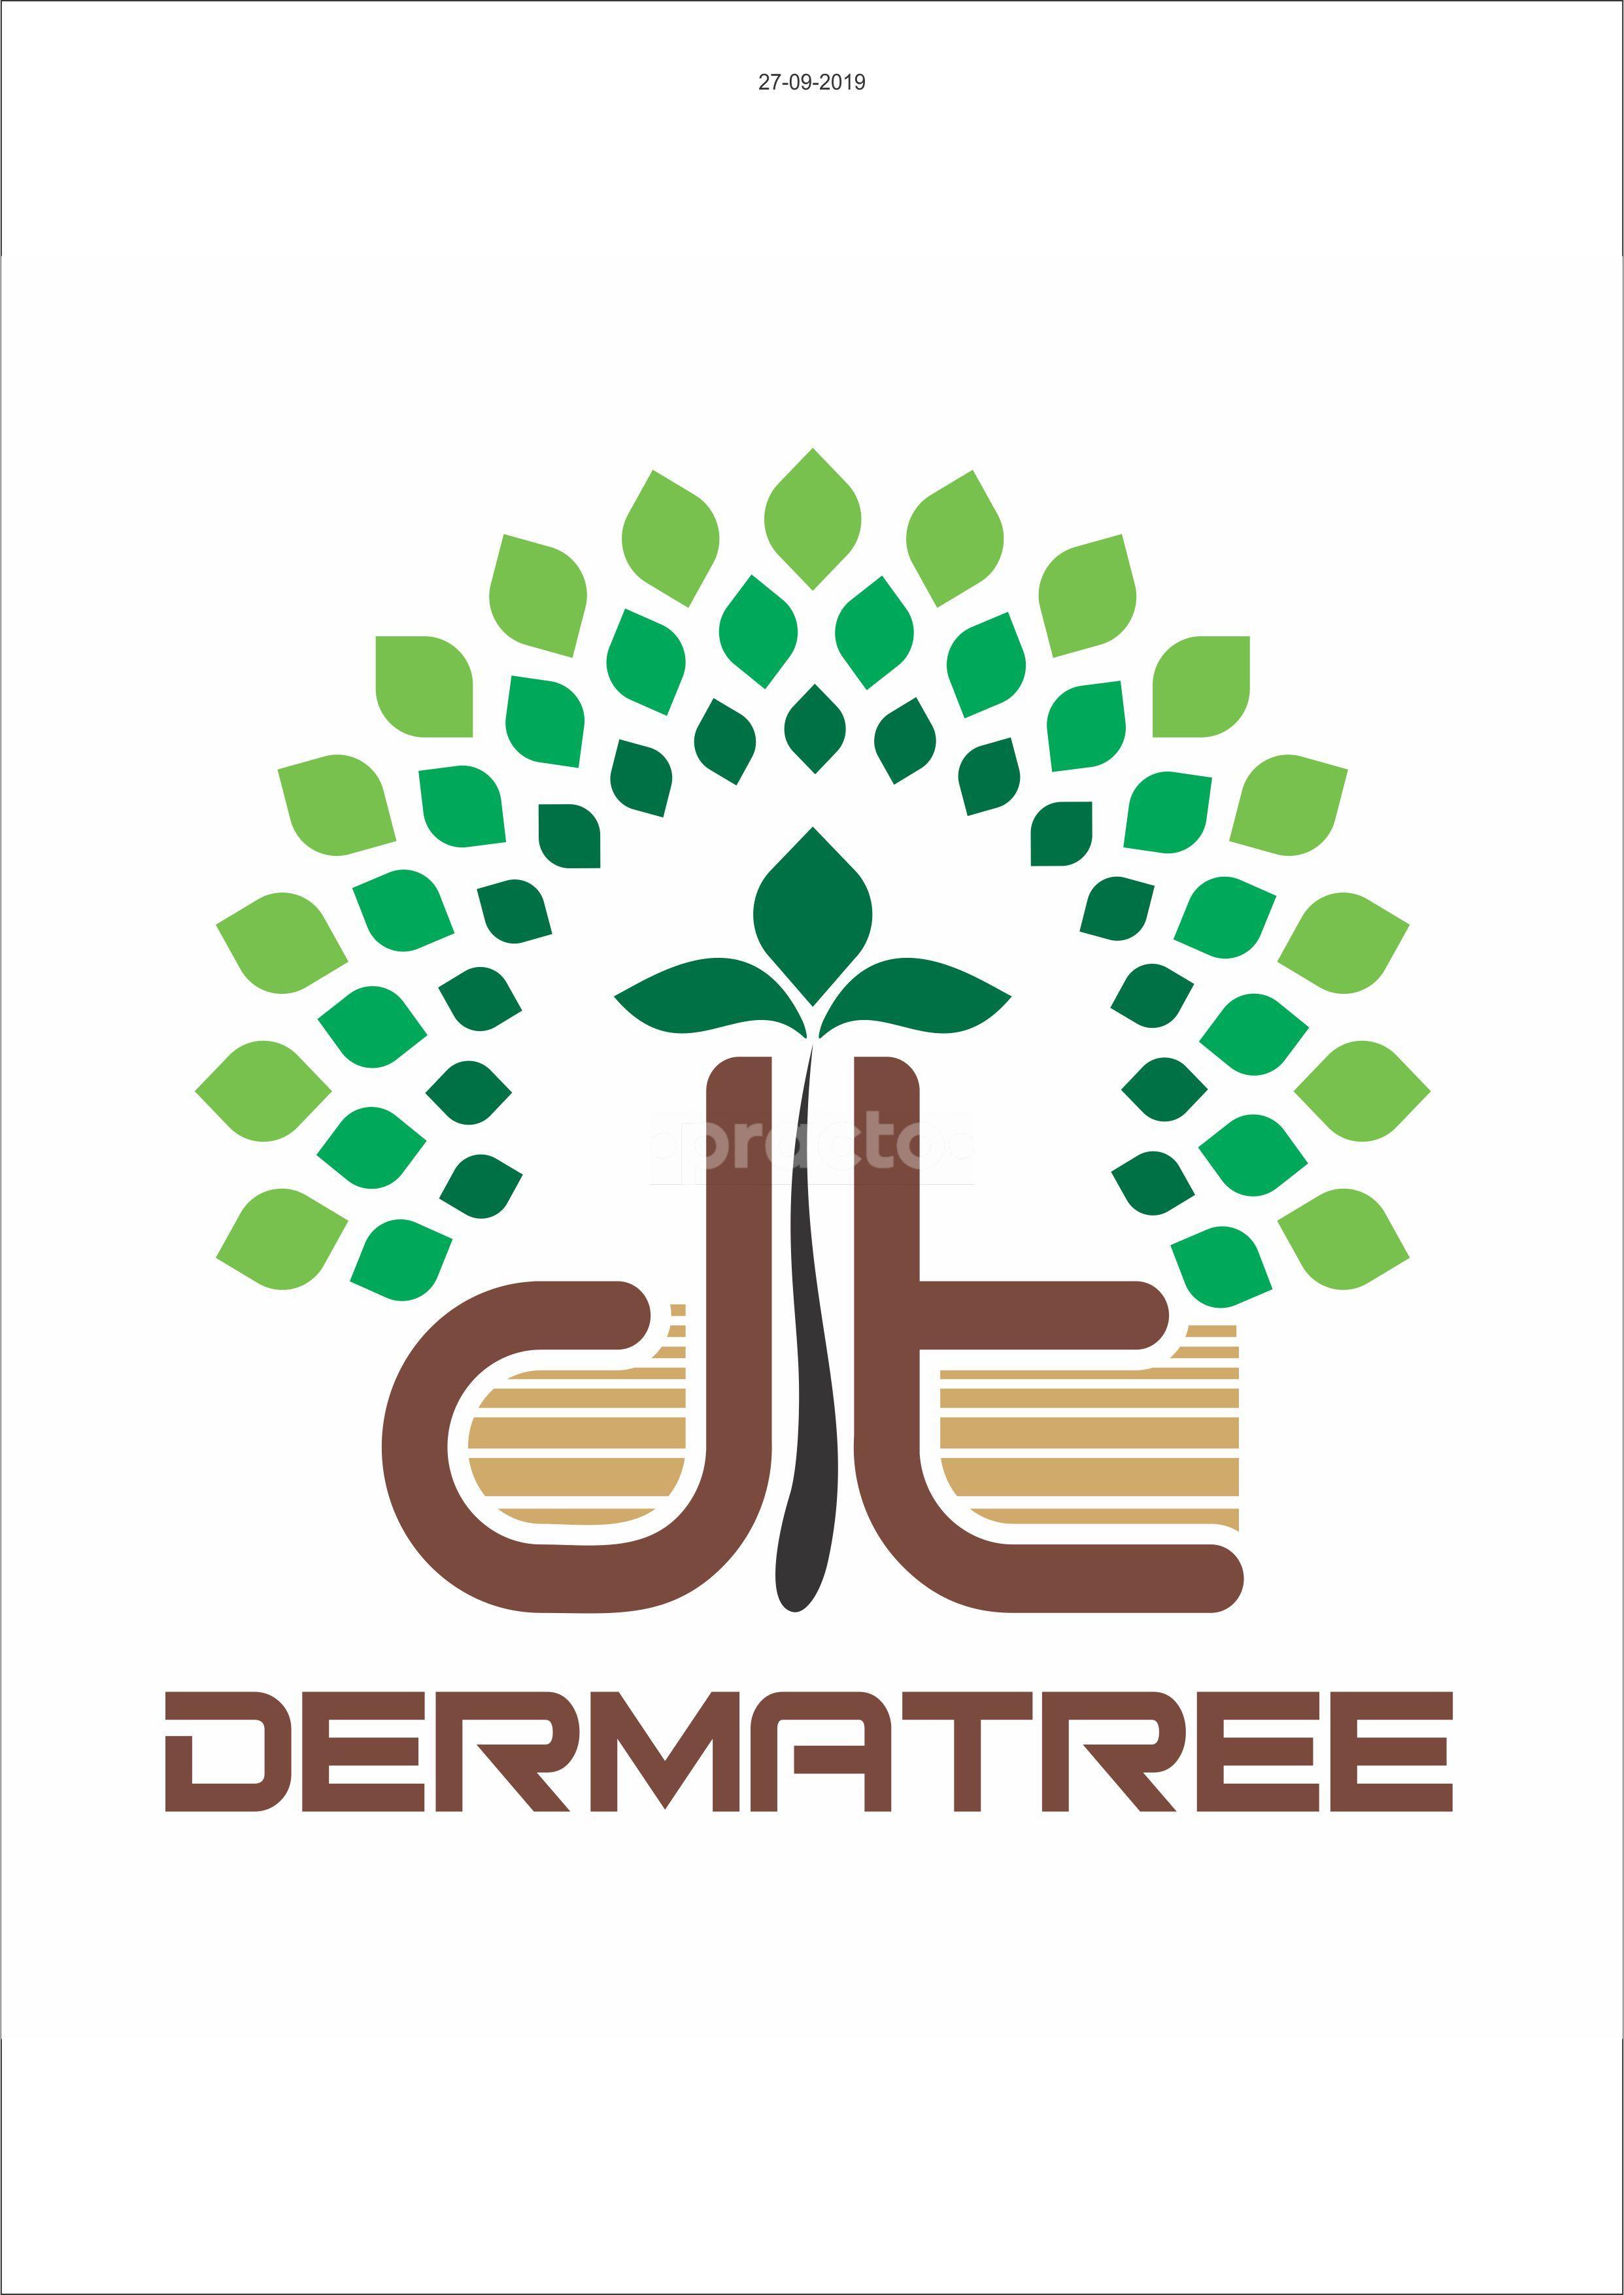 Dermatree Skin and Hair Clinic